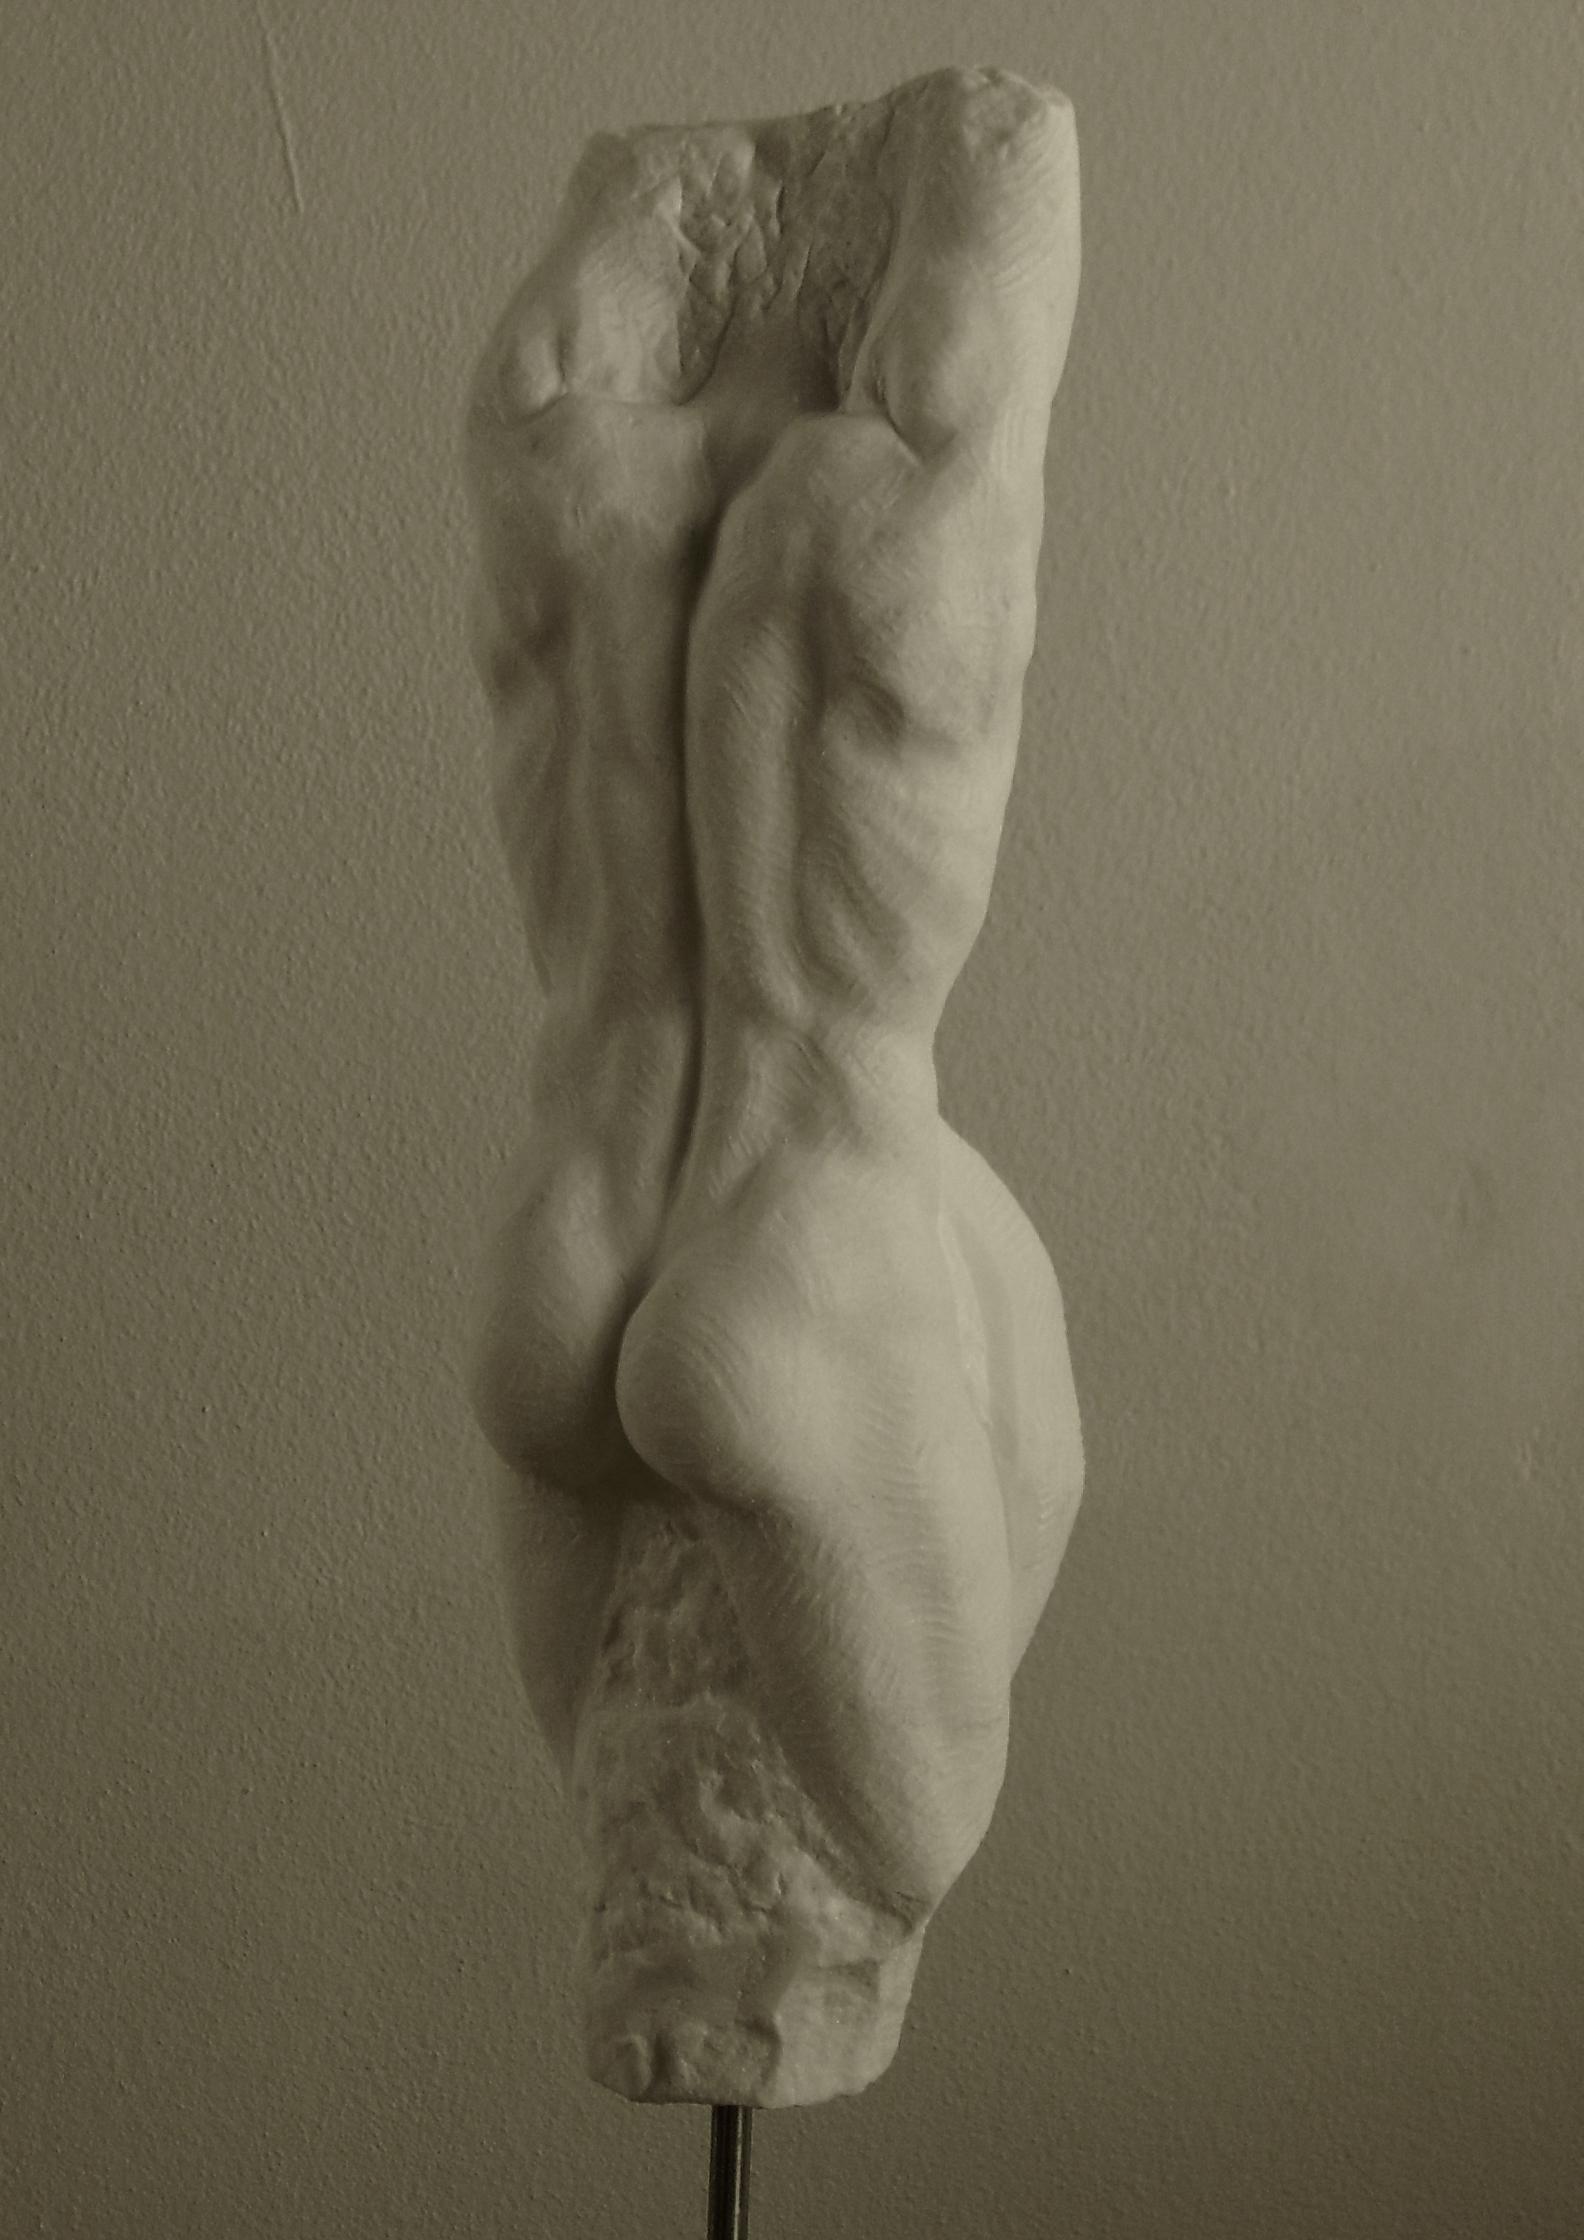 Temistocle 2006 marmo statuario 63x15